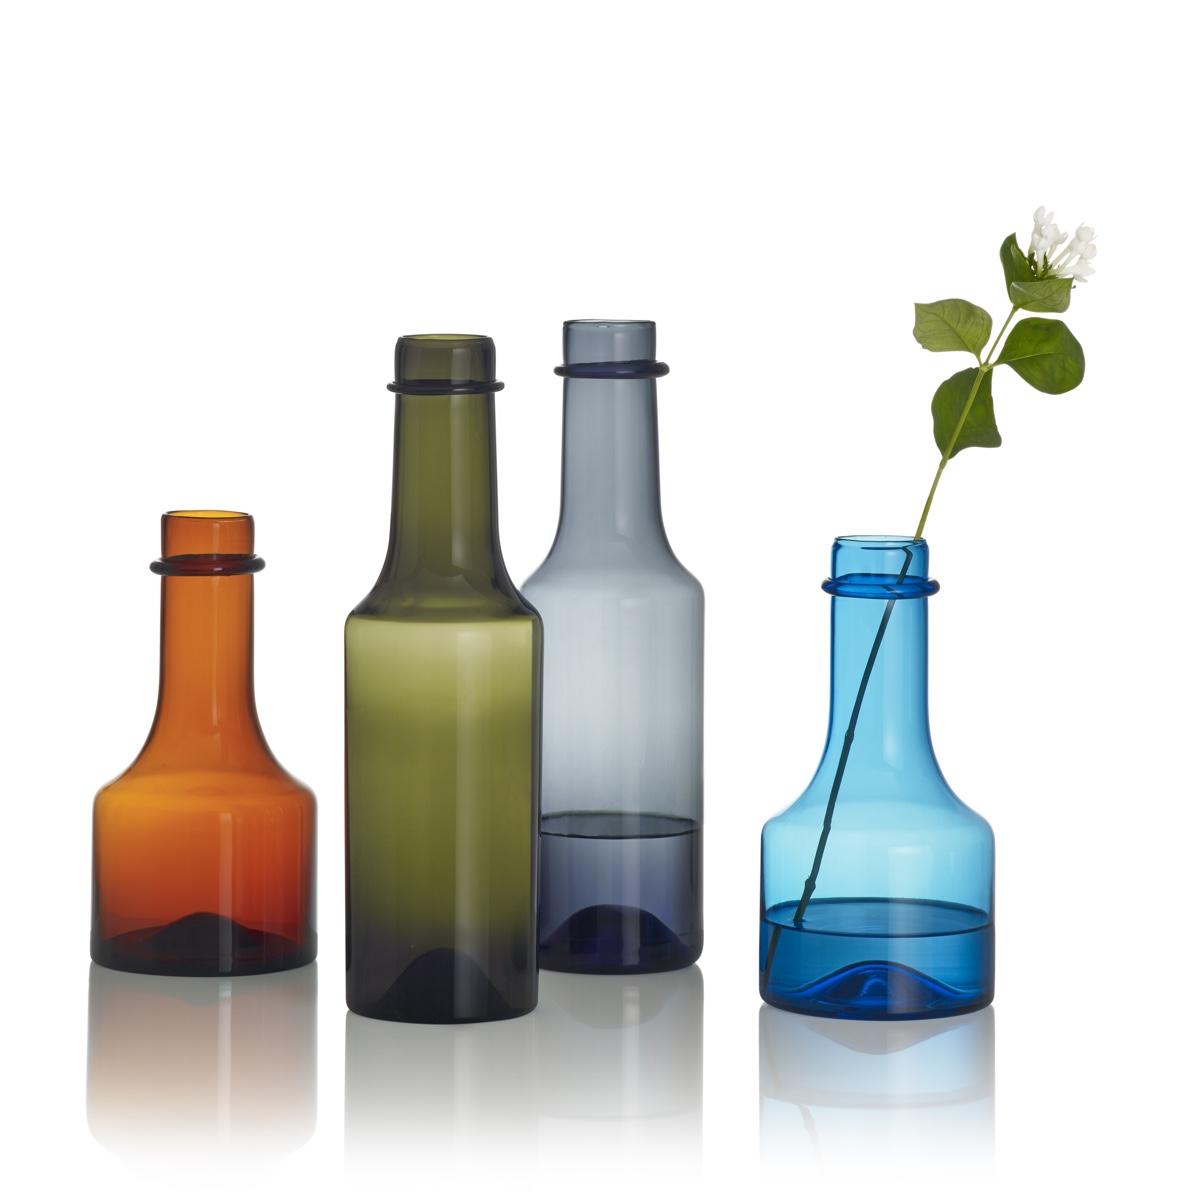 Wirkkalaglass bottles. Designed by Tapio Wirkkala and originally produced by Iittala between 1959 and 1968. Image© Fiskars Finland.